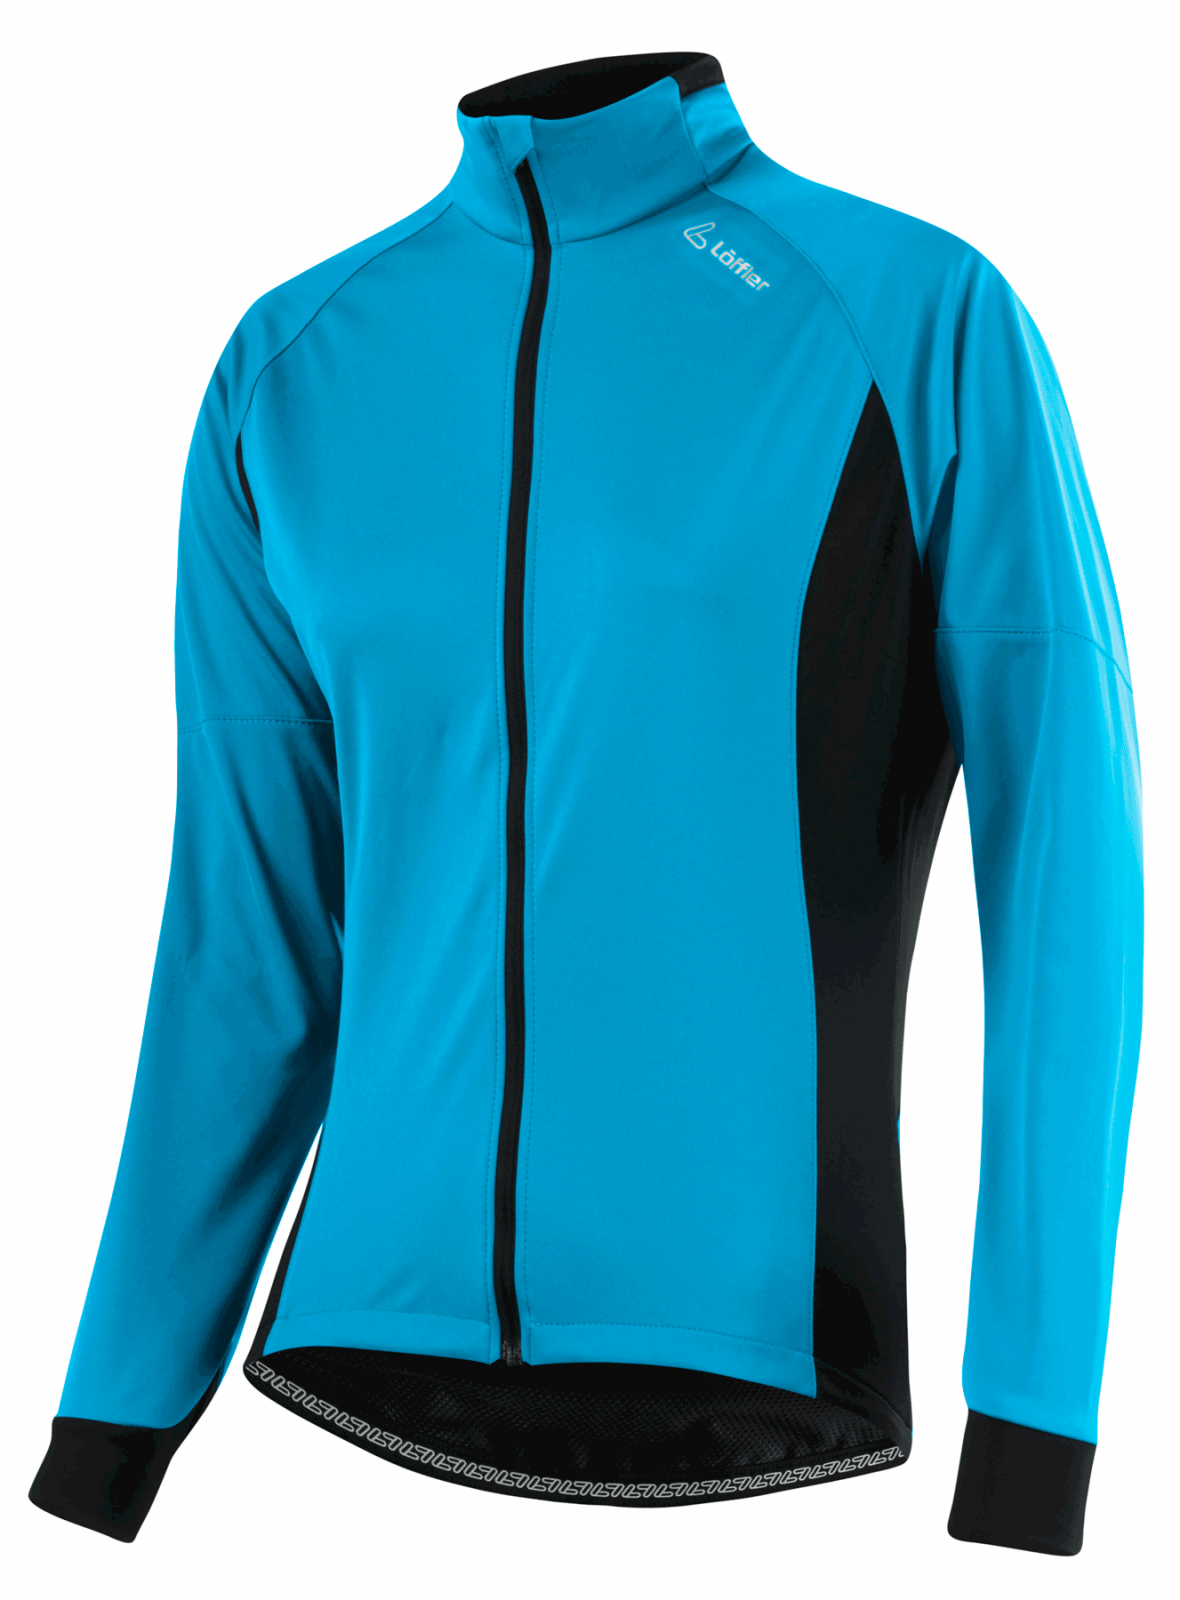 Dámská cyklistická softshell bunda Löffler Trentino WS Softshell